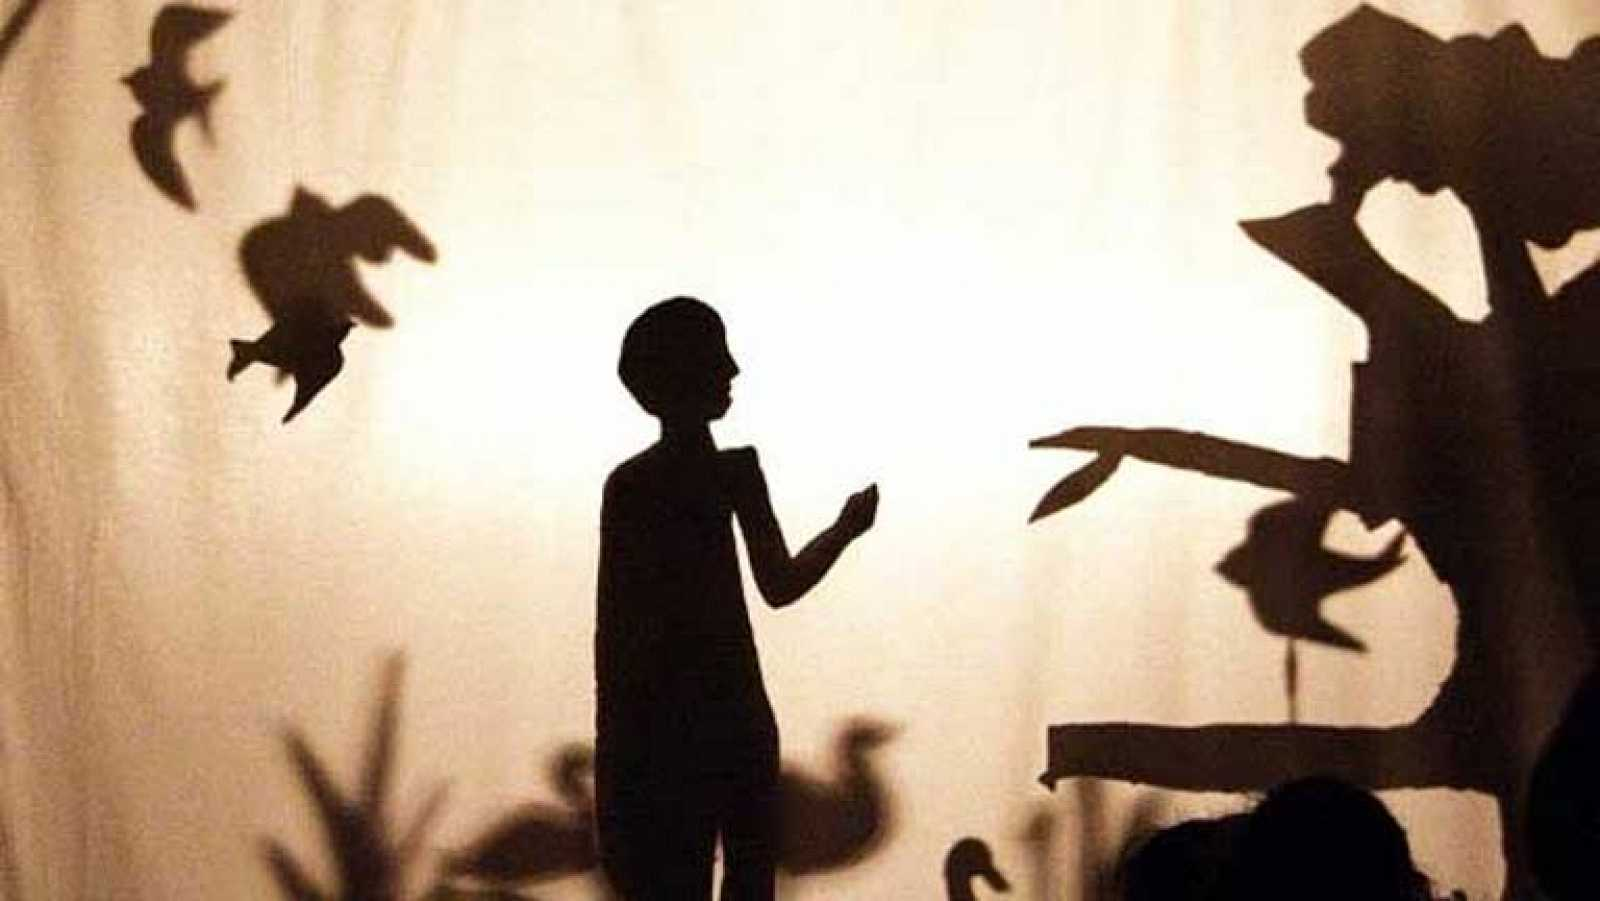 historia del teatro sombras